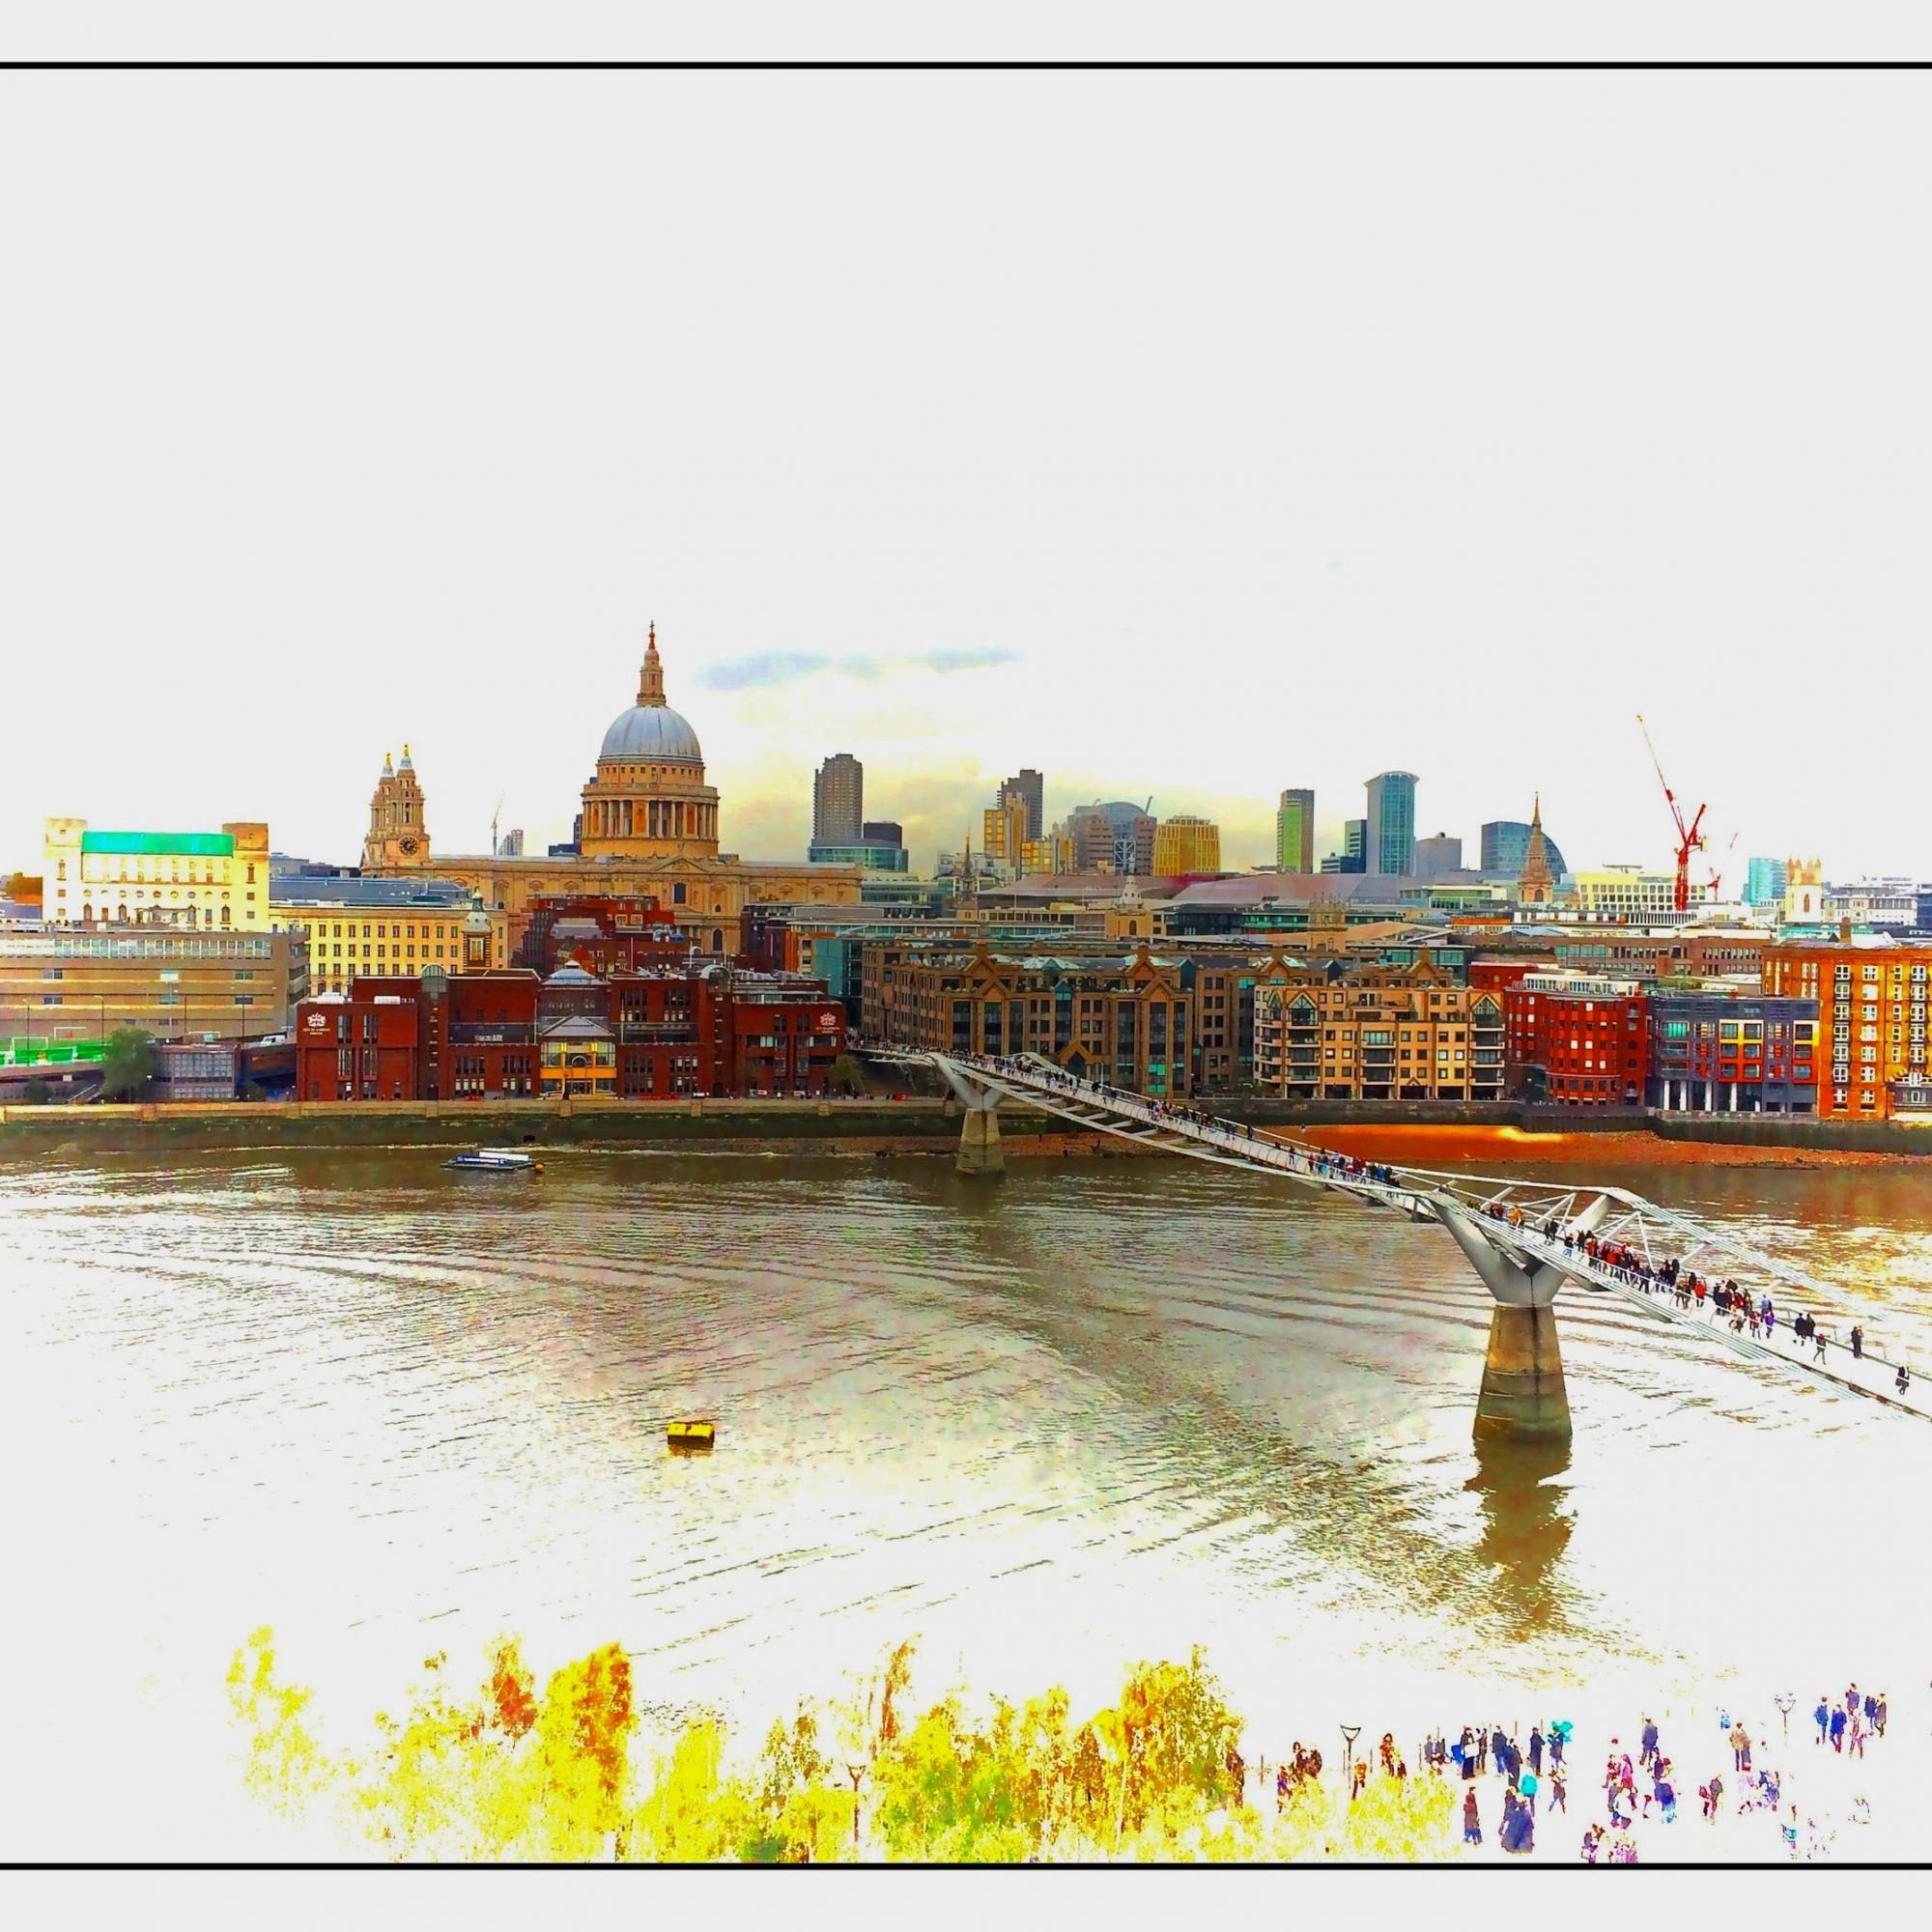 Millennium Bridge and the City of London